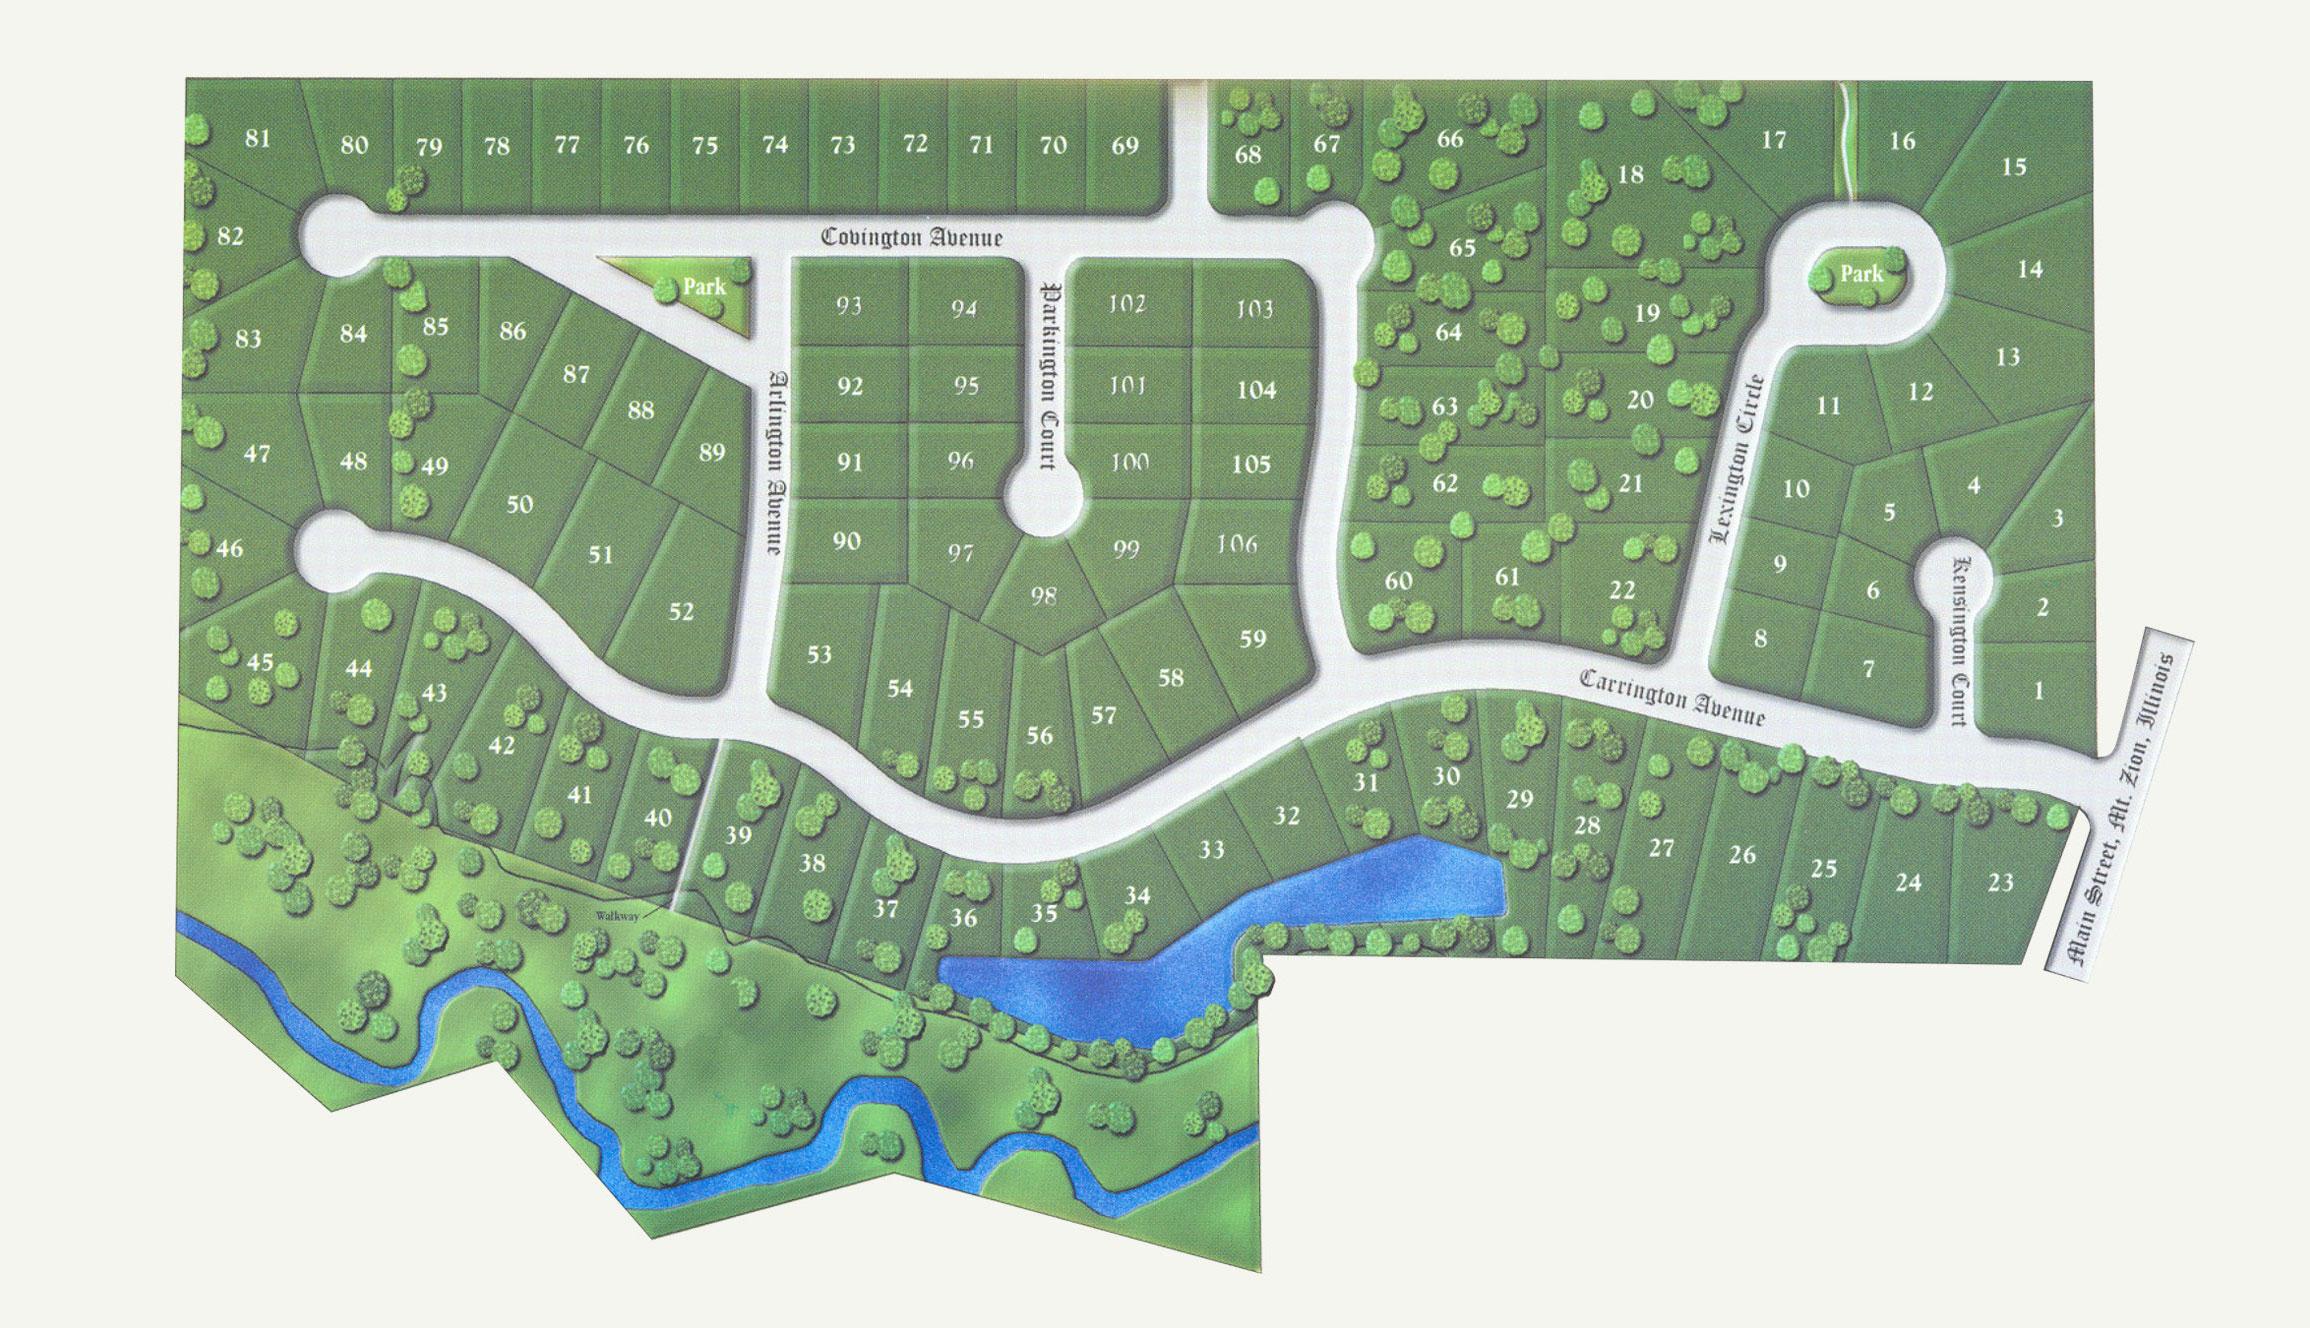 SALewis-Residential-Plat-Carrington.jpg